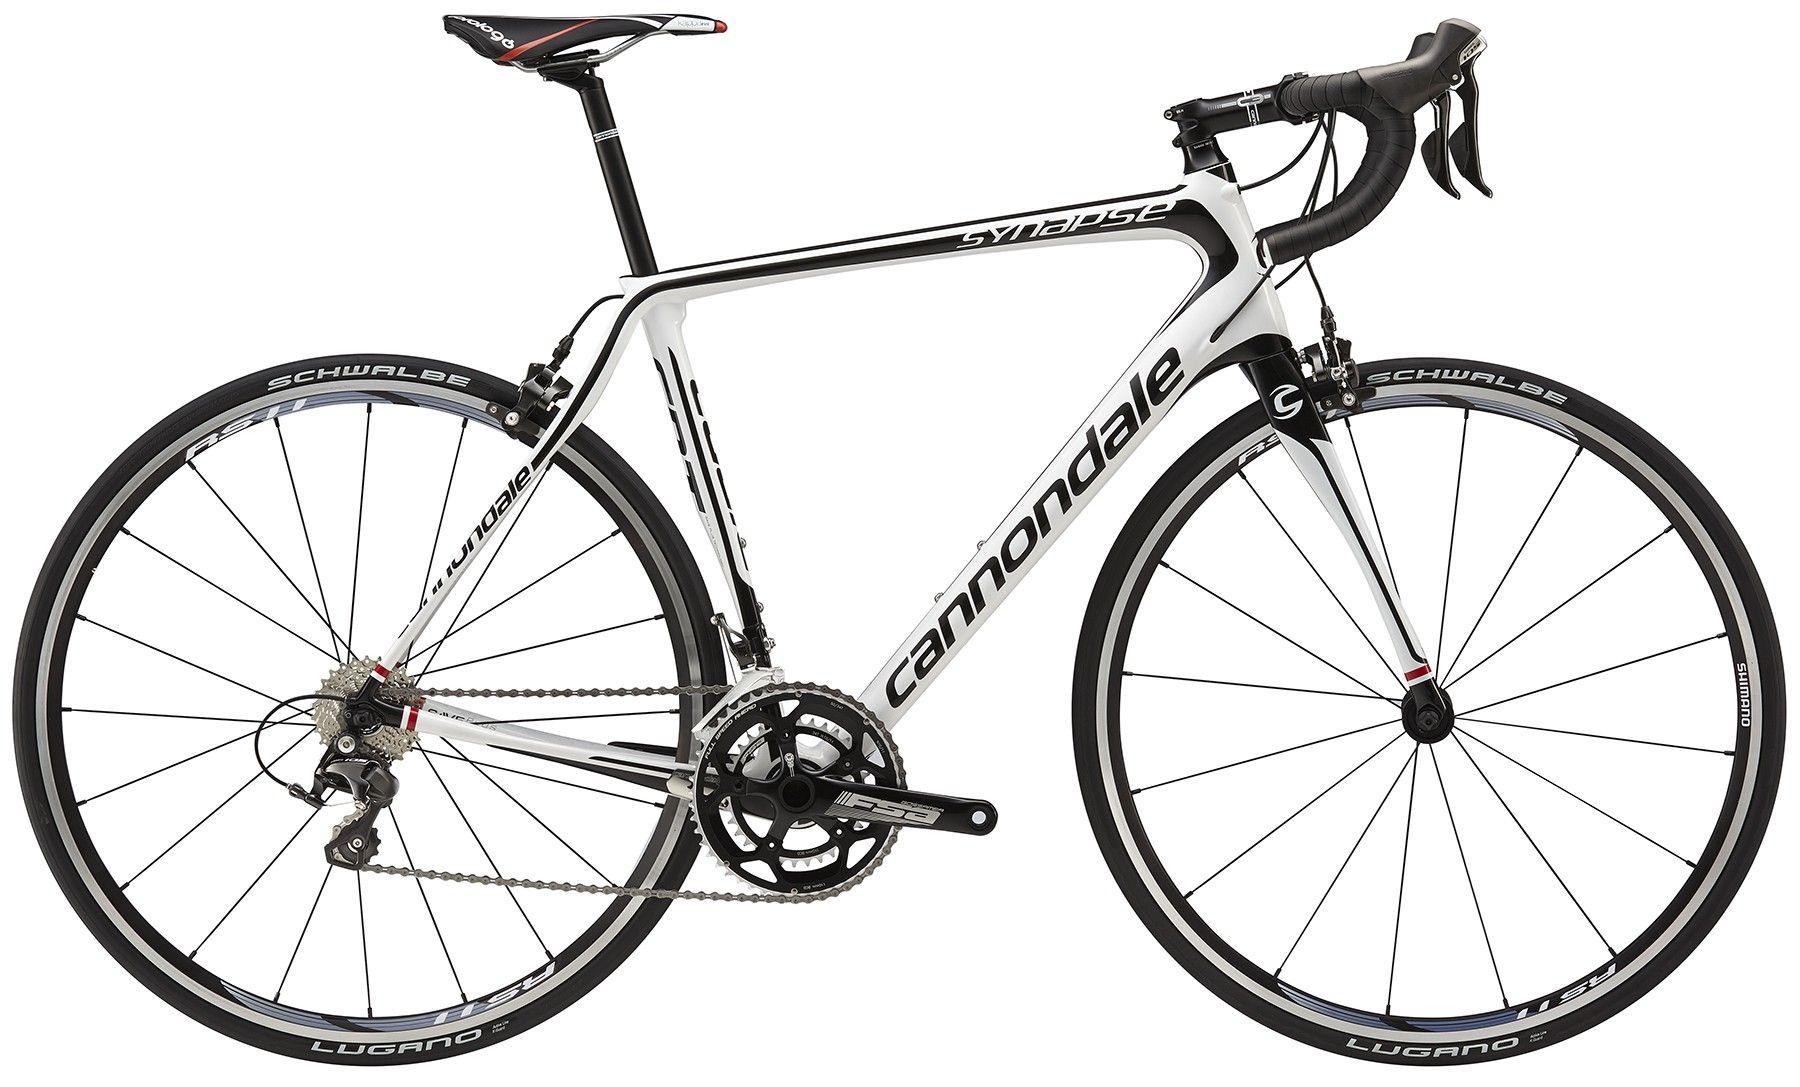 Cannondale Synapse Carbon 105 5 56 Cm Frame Cannondale Best Road Bike Road Bikes